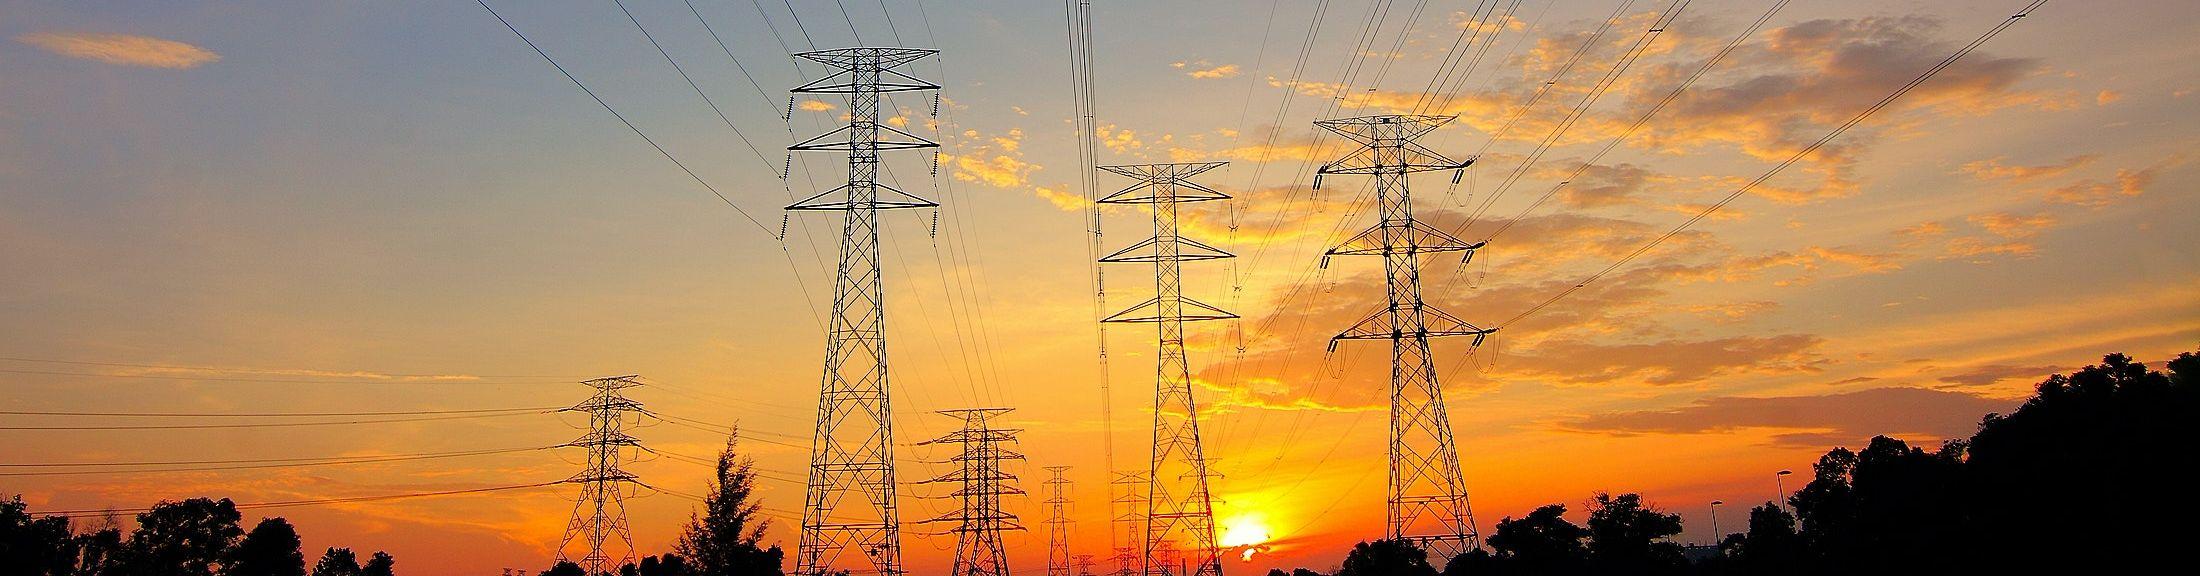 AleaSoft - Power lines electricity